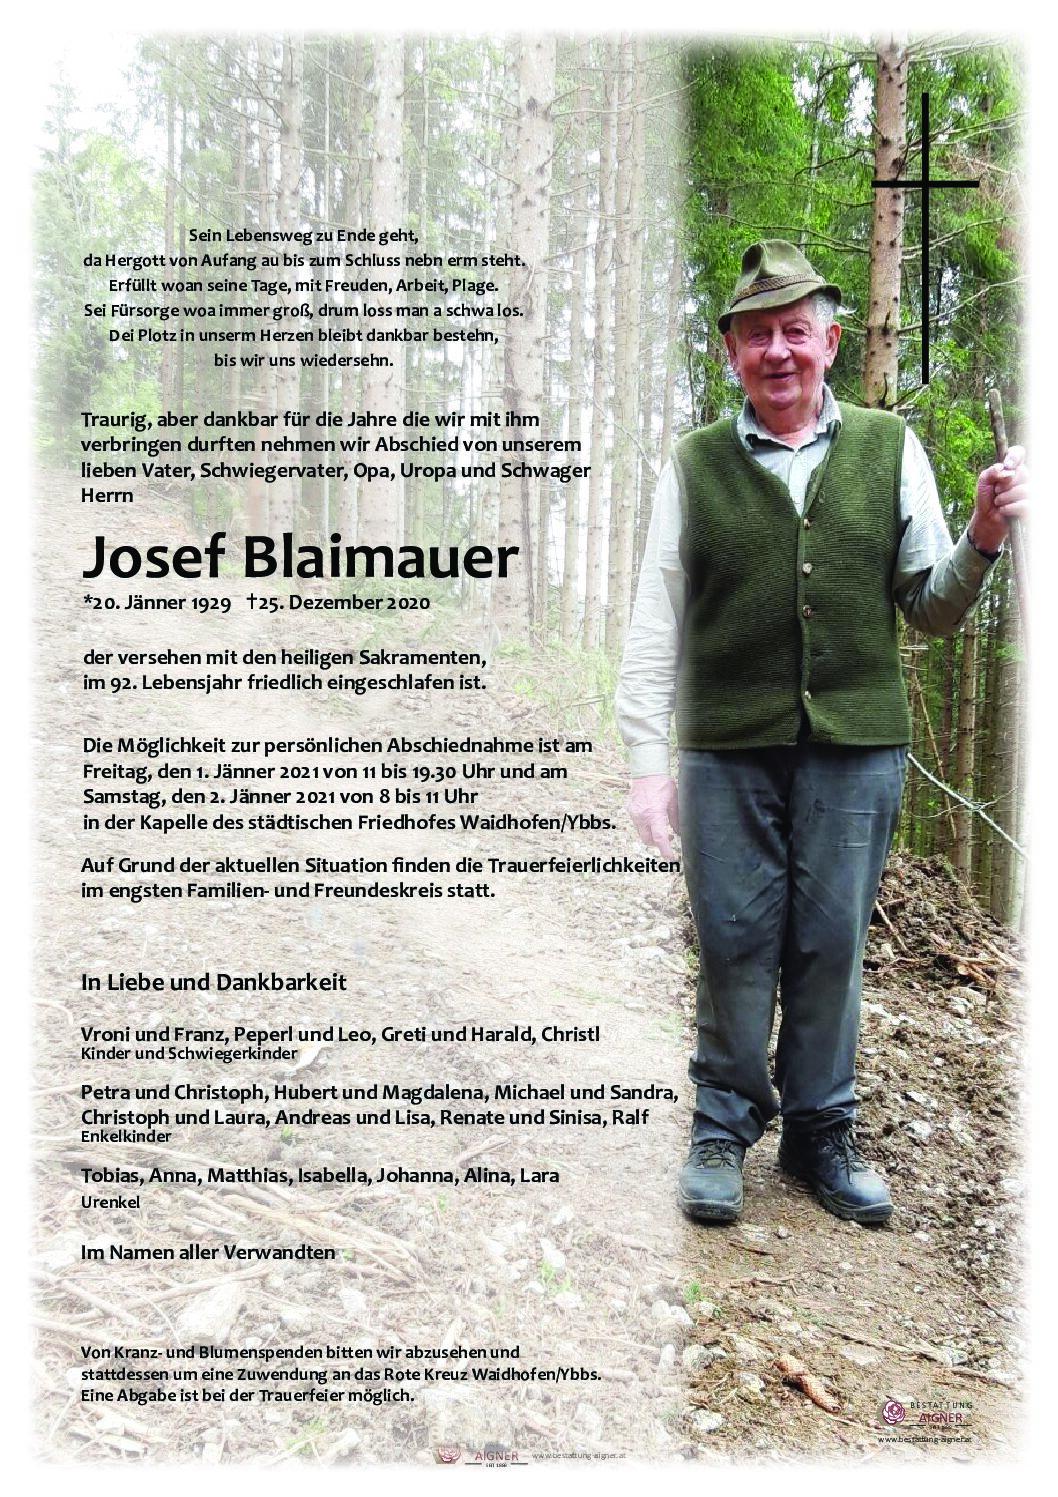 Josef Blaimauer